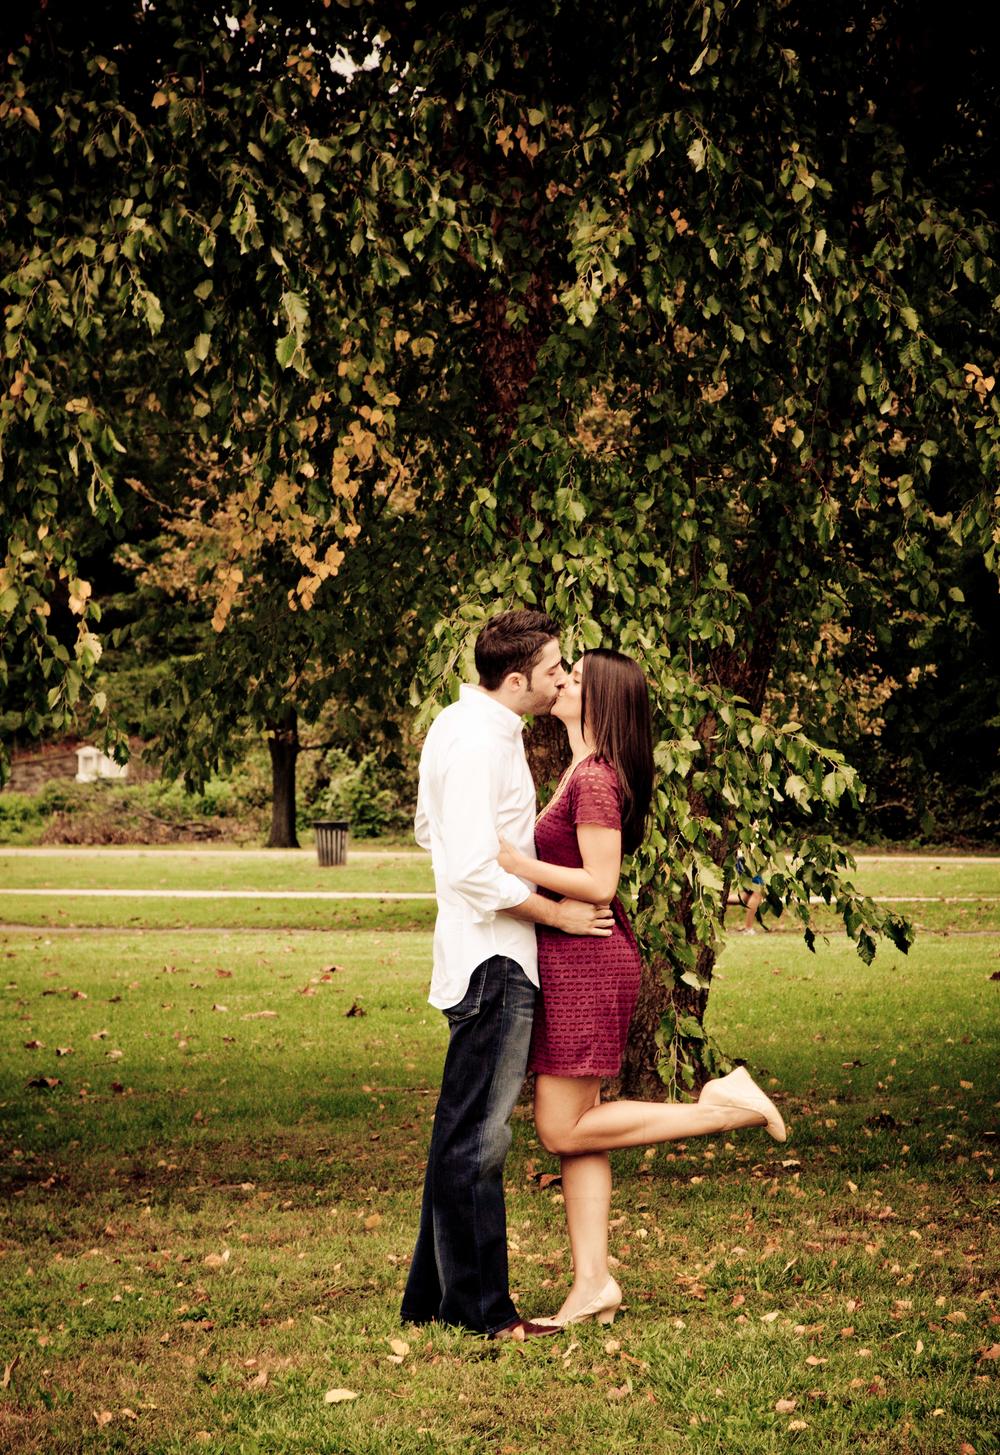 kissingac.jpg